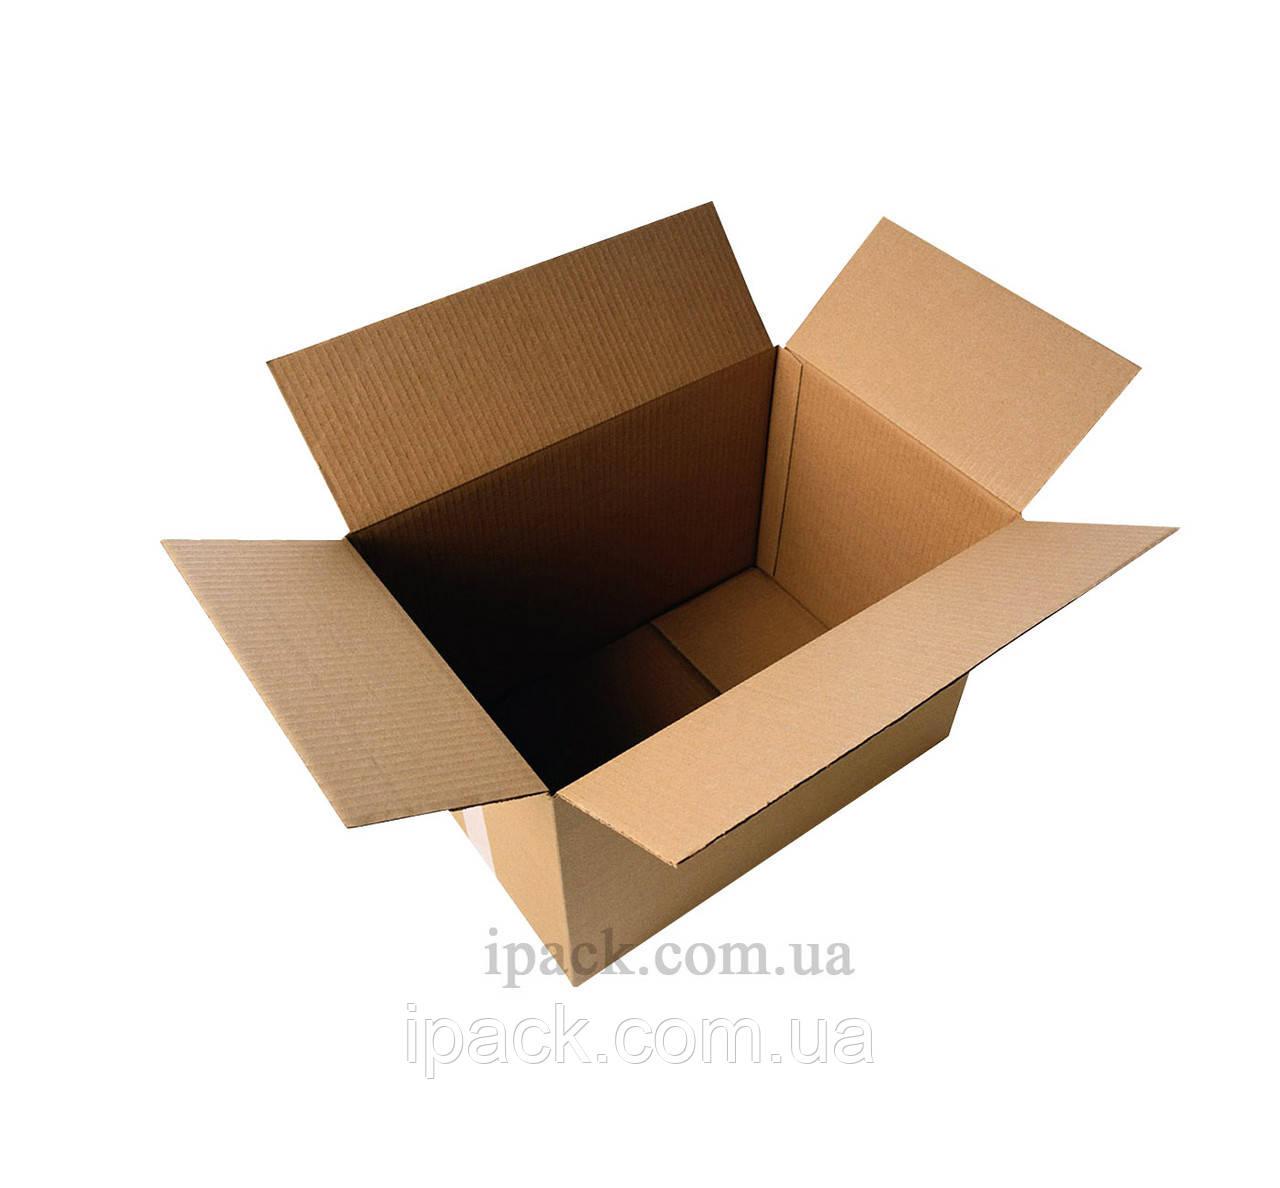 Гофроящик 270*200*235 мм, бурый, четырехклапанный картонный короб